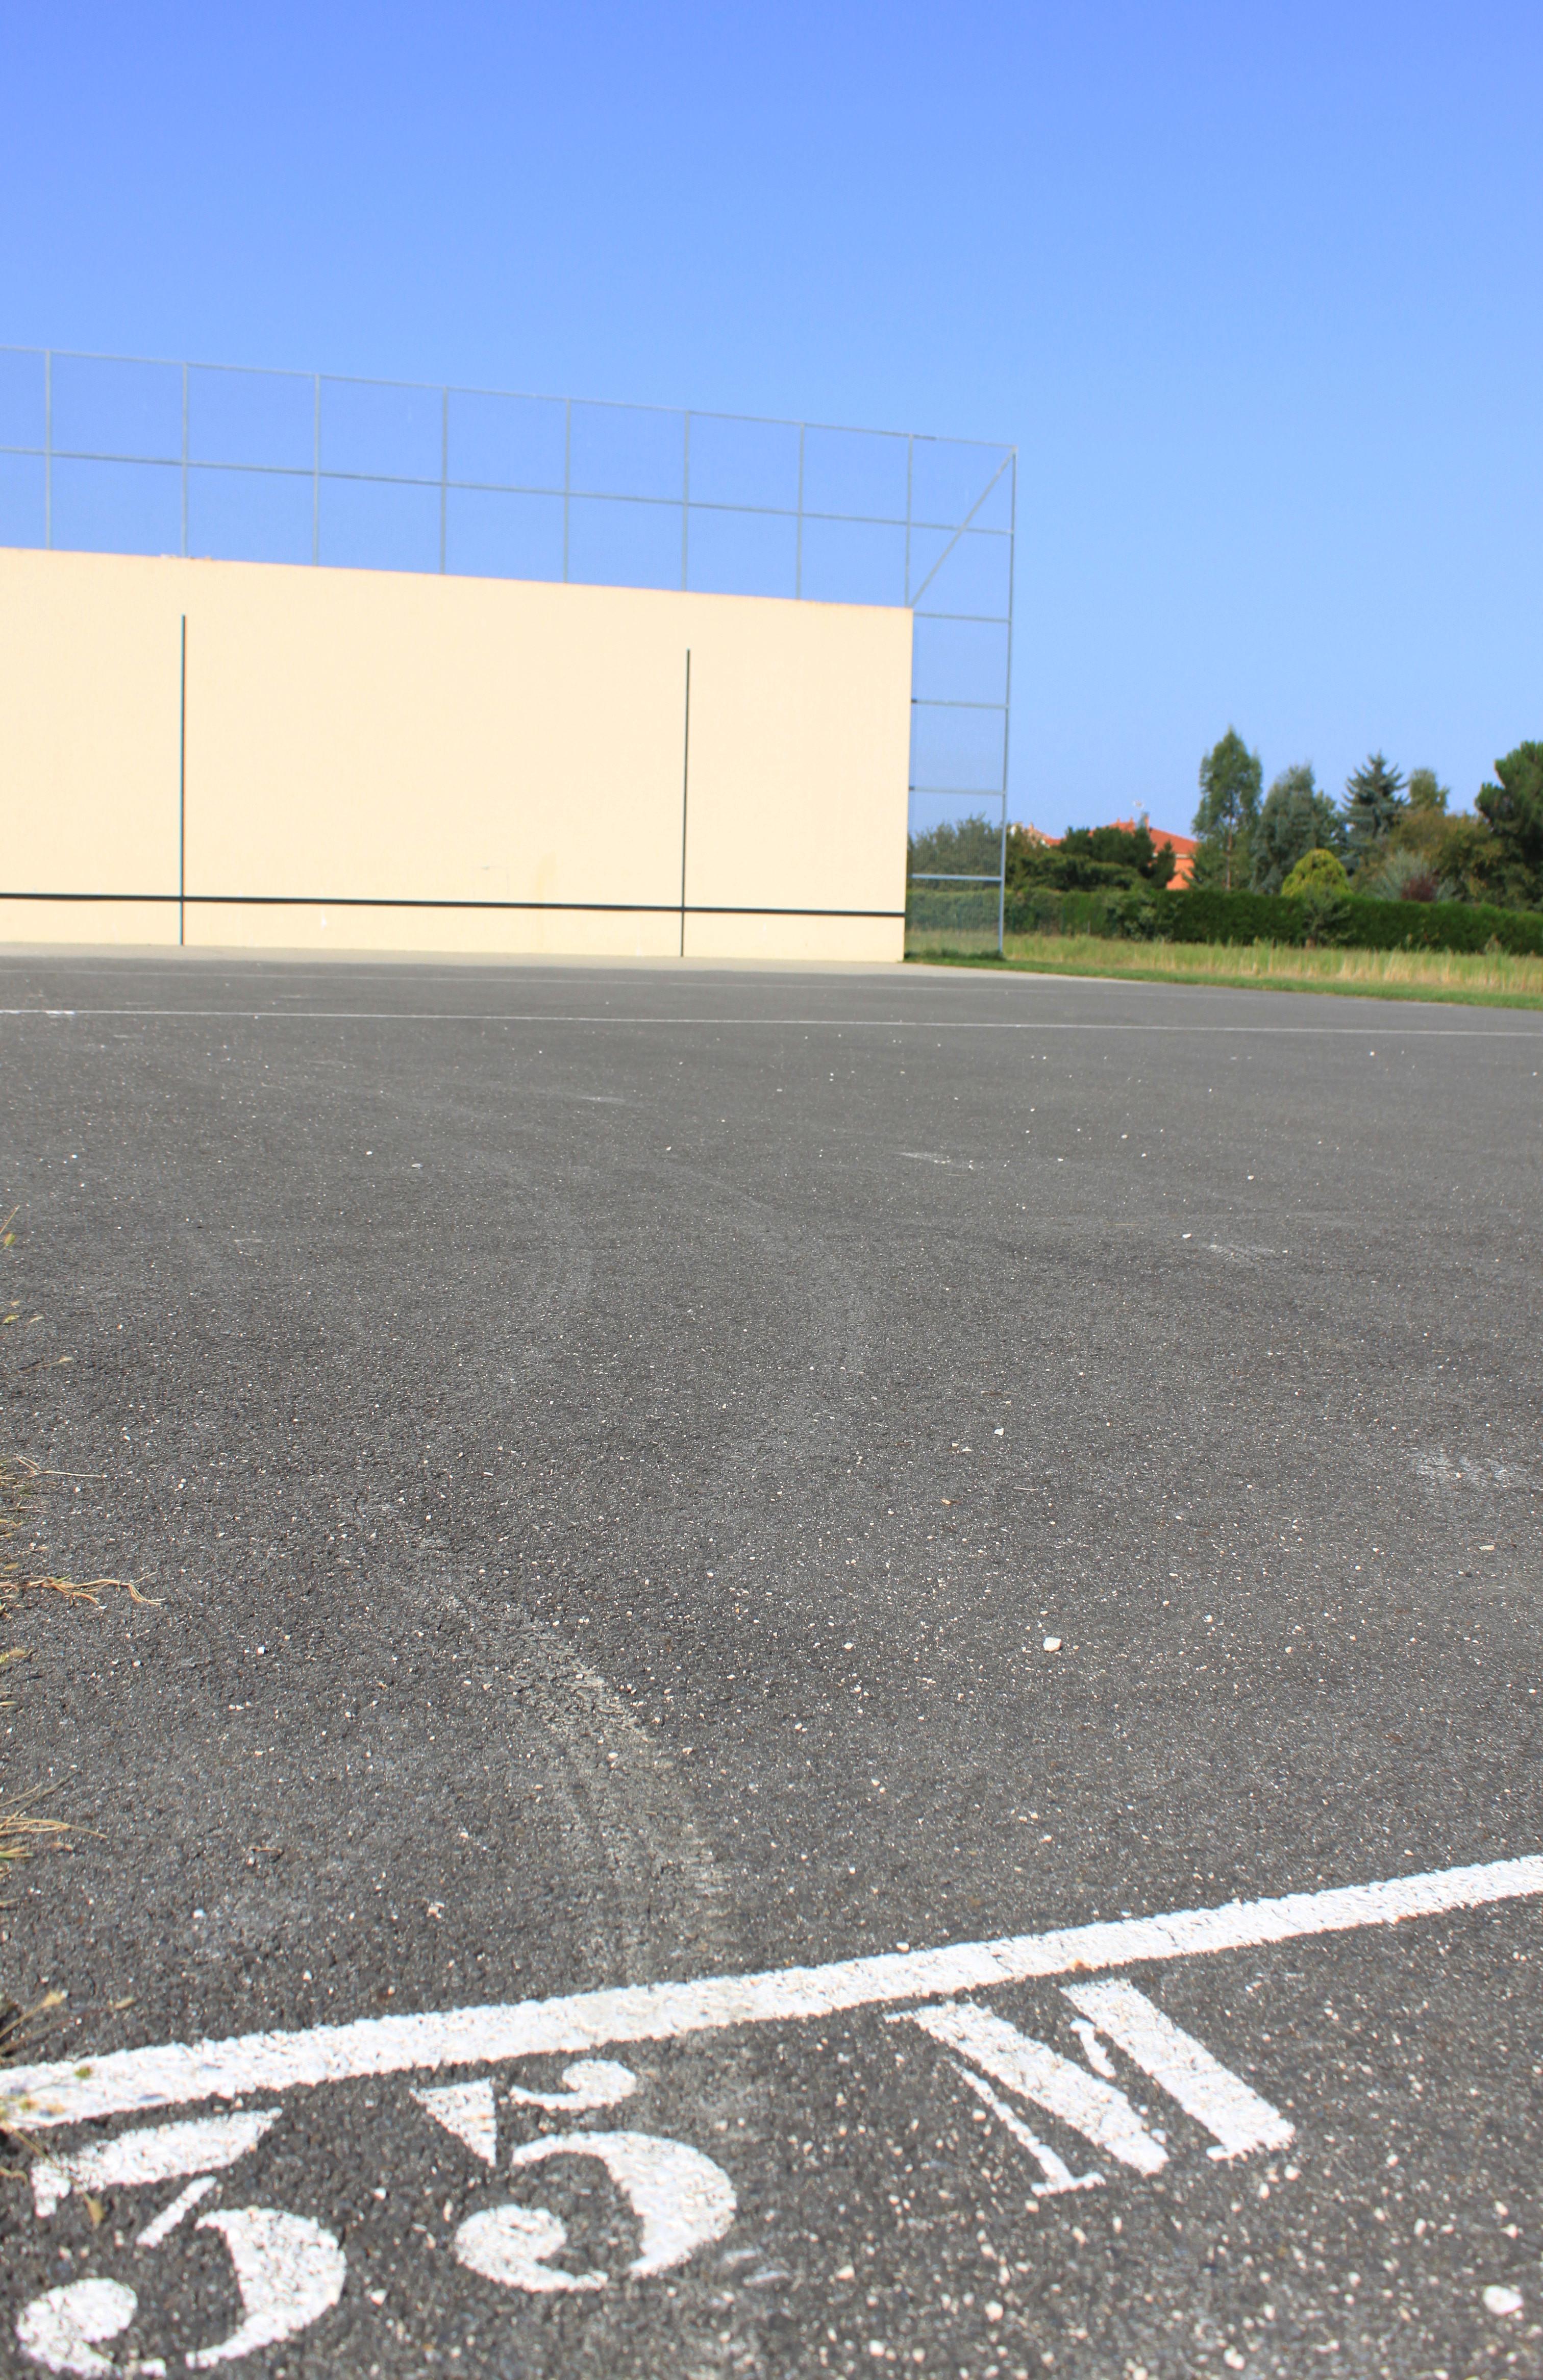 terrain pelote EMSA 2.JPG